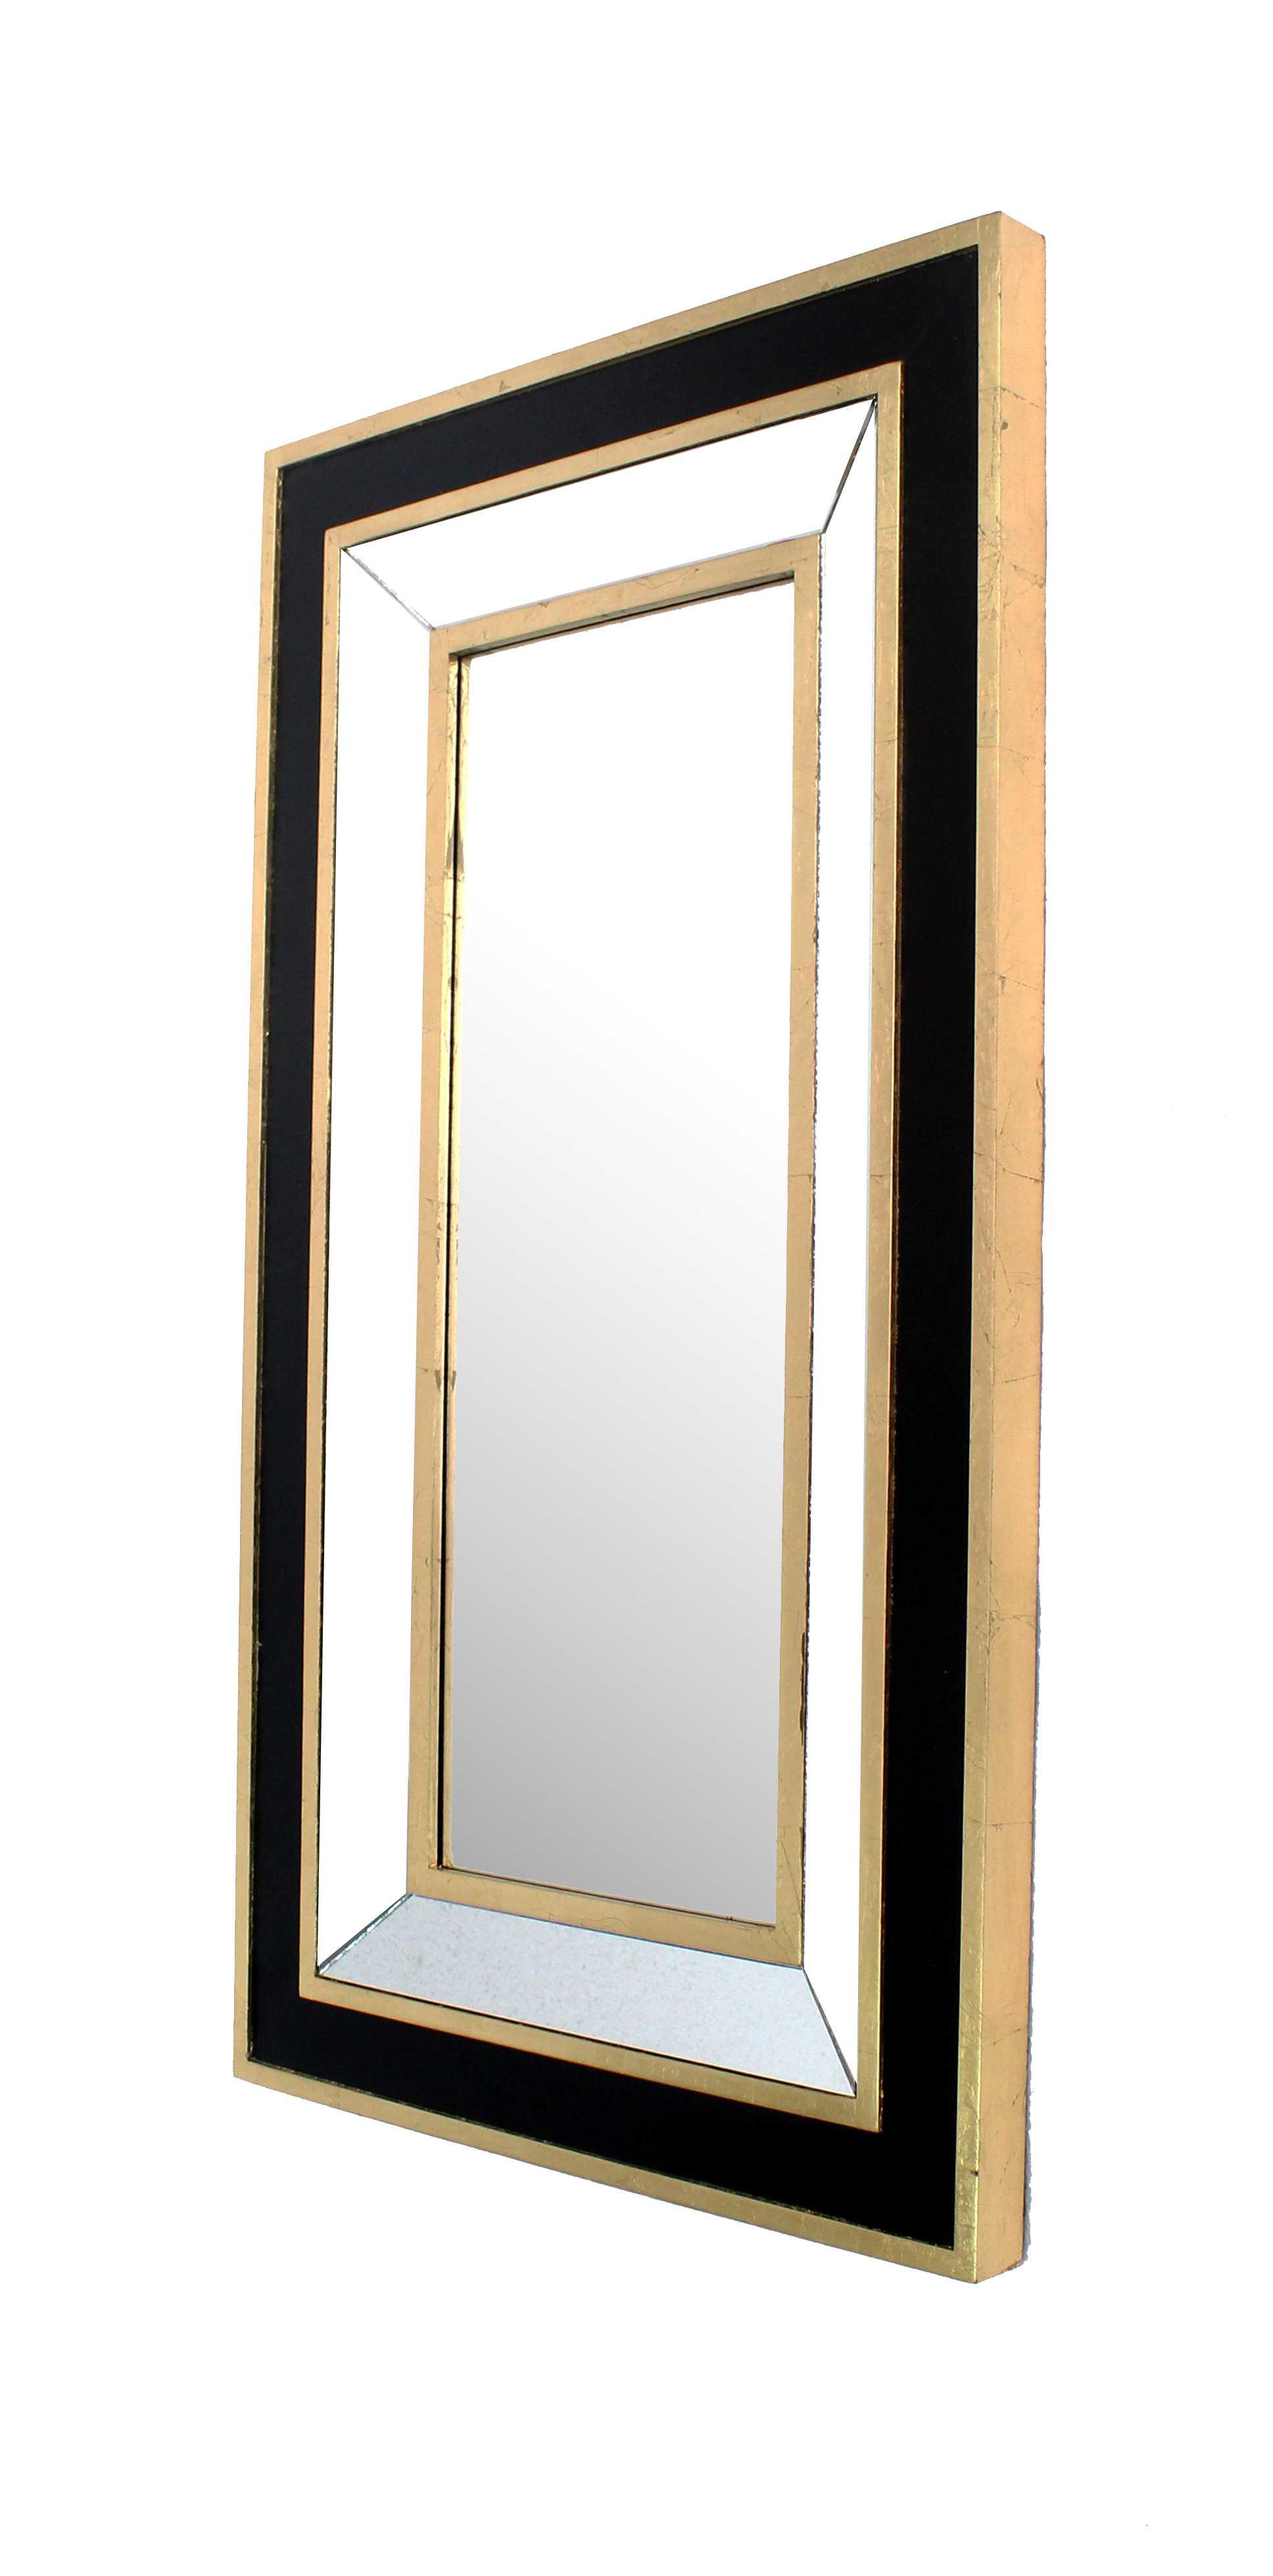 "43"" x 24"" x 2"" Black & Gold, Classic Dressing - Mirror"